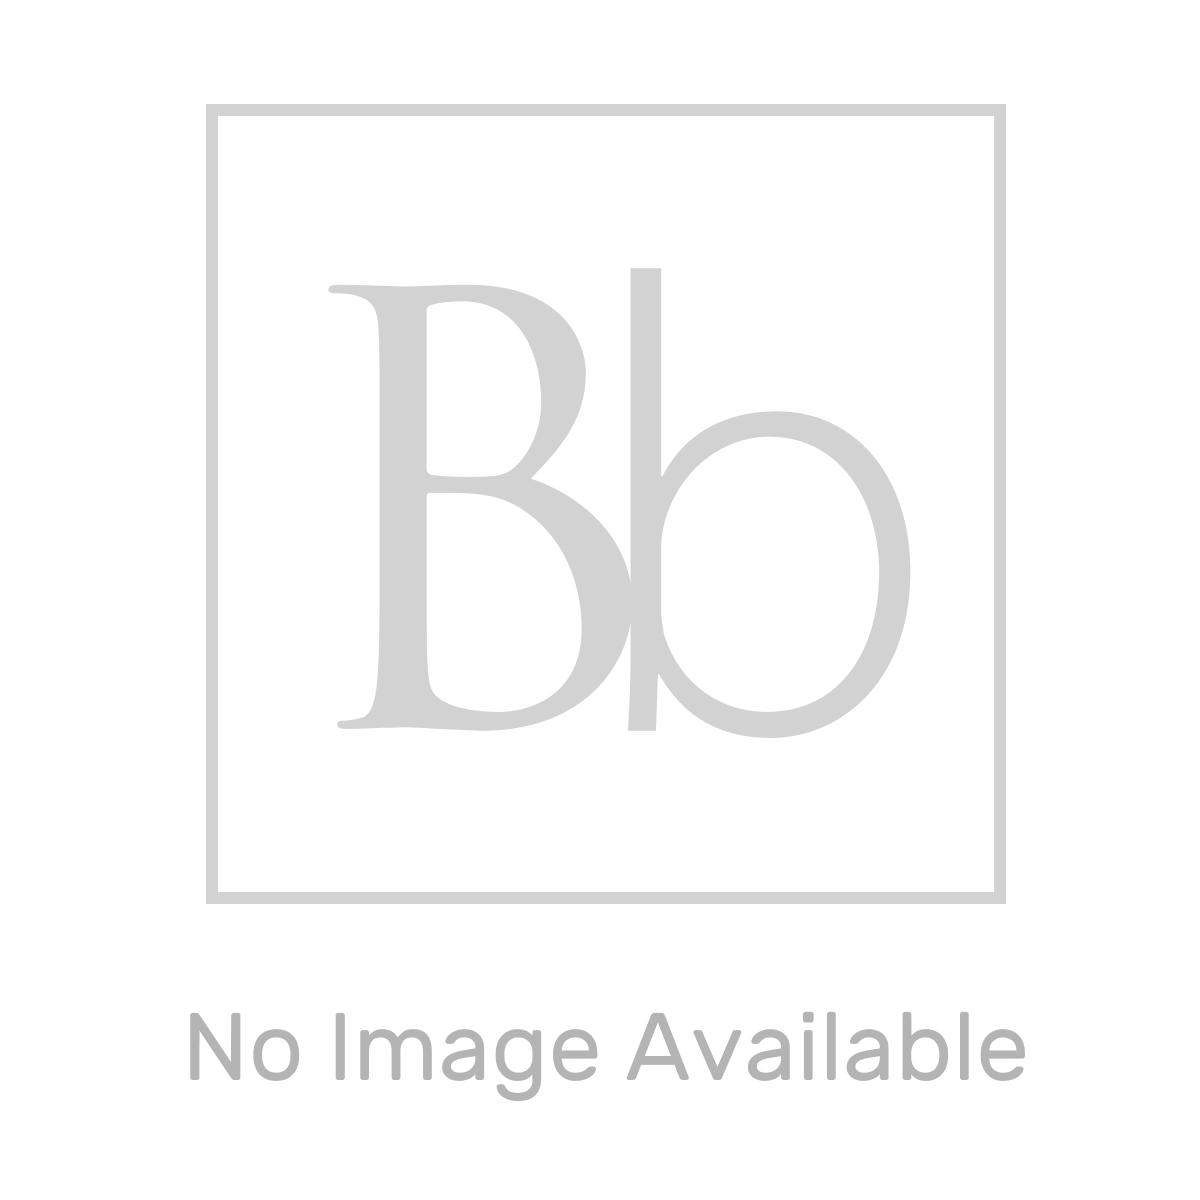 HiB Orb 60 LED Steam Free Bathroom Mirror